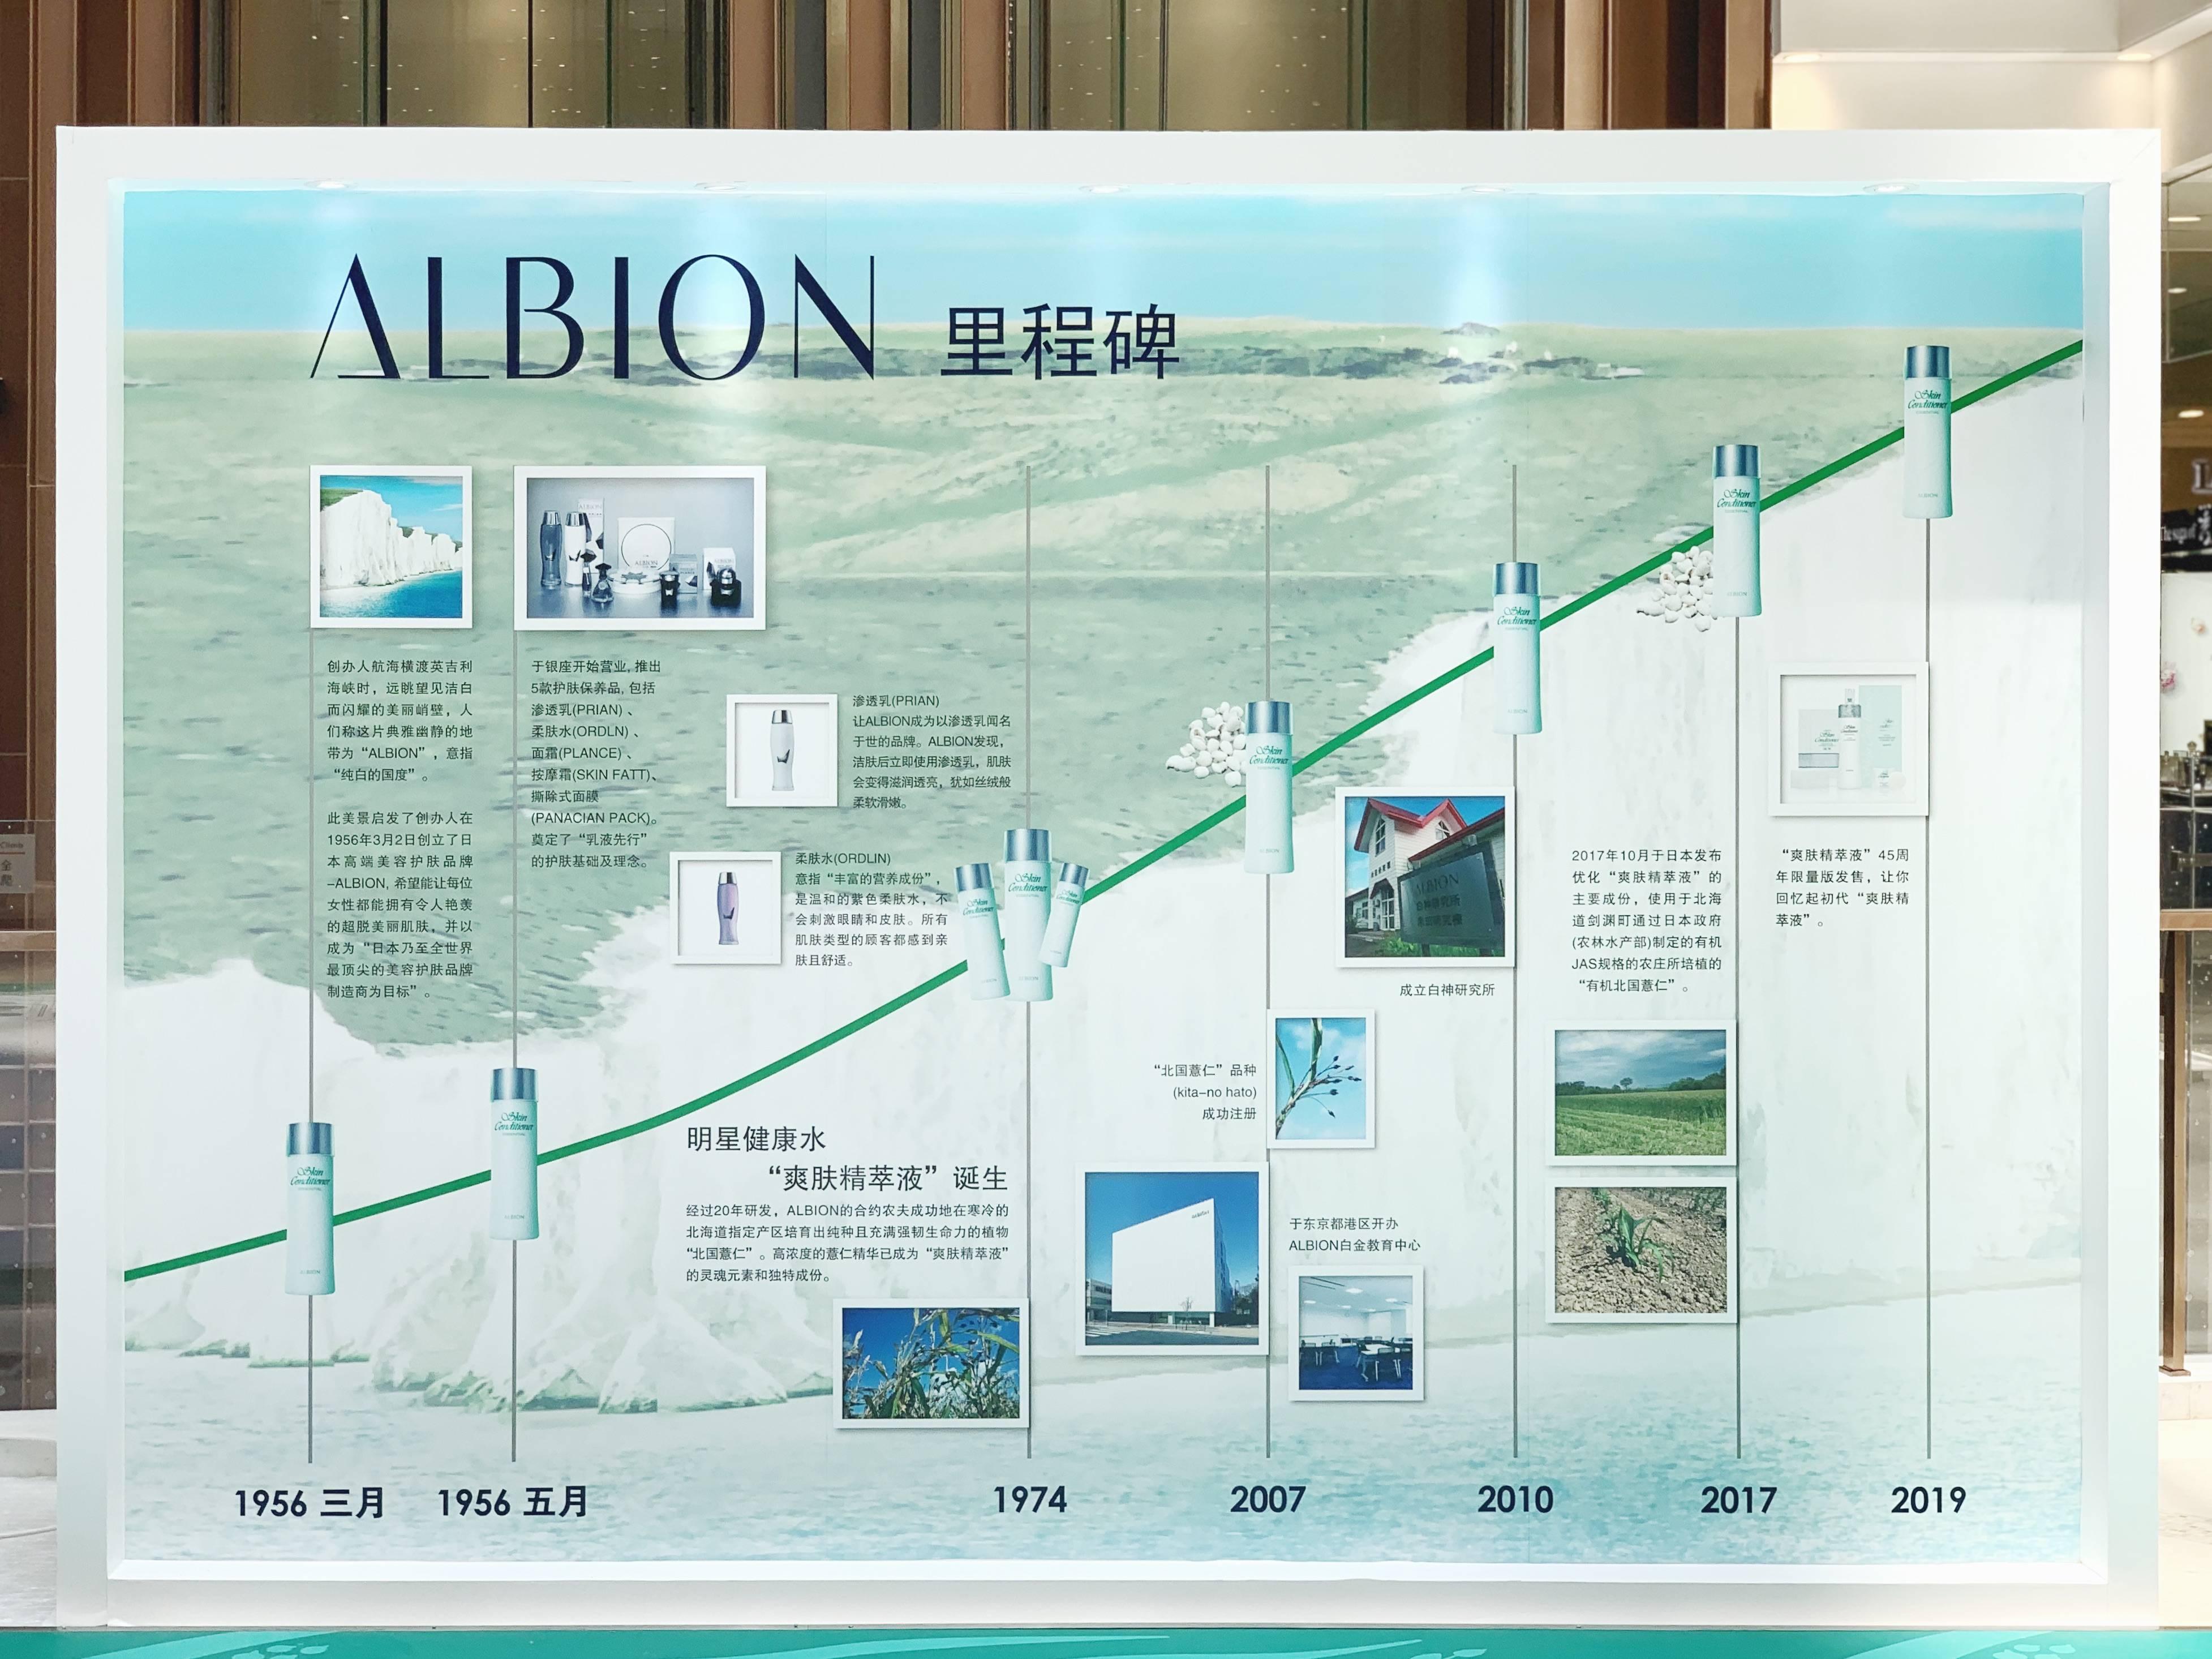 ALBION澳尔滨携手天猫超级品牌日,激活植萃能量,强韧健康美肌插图(2)